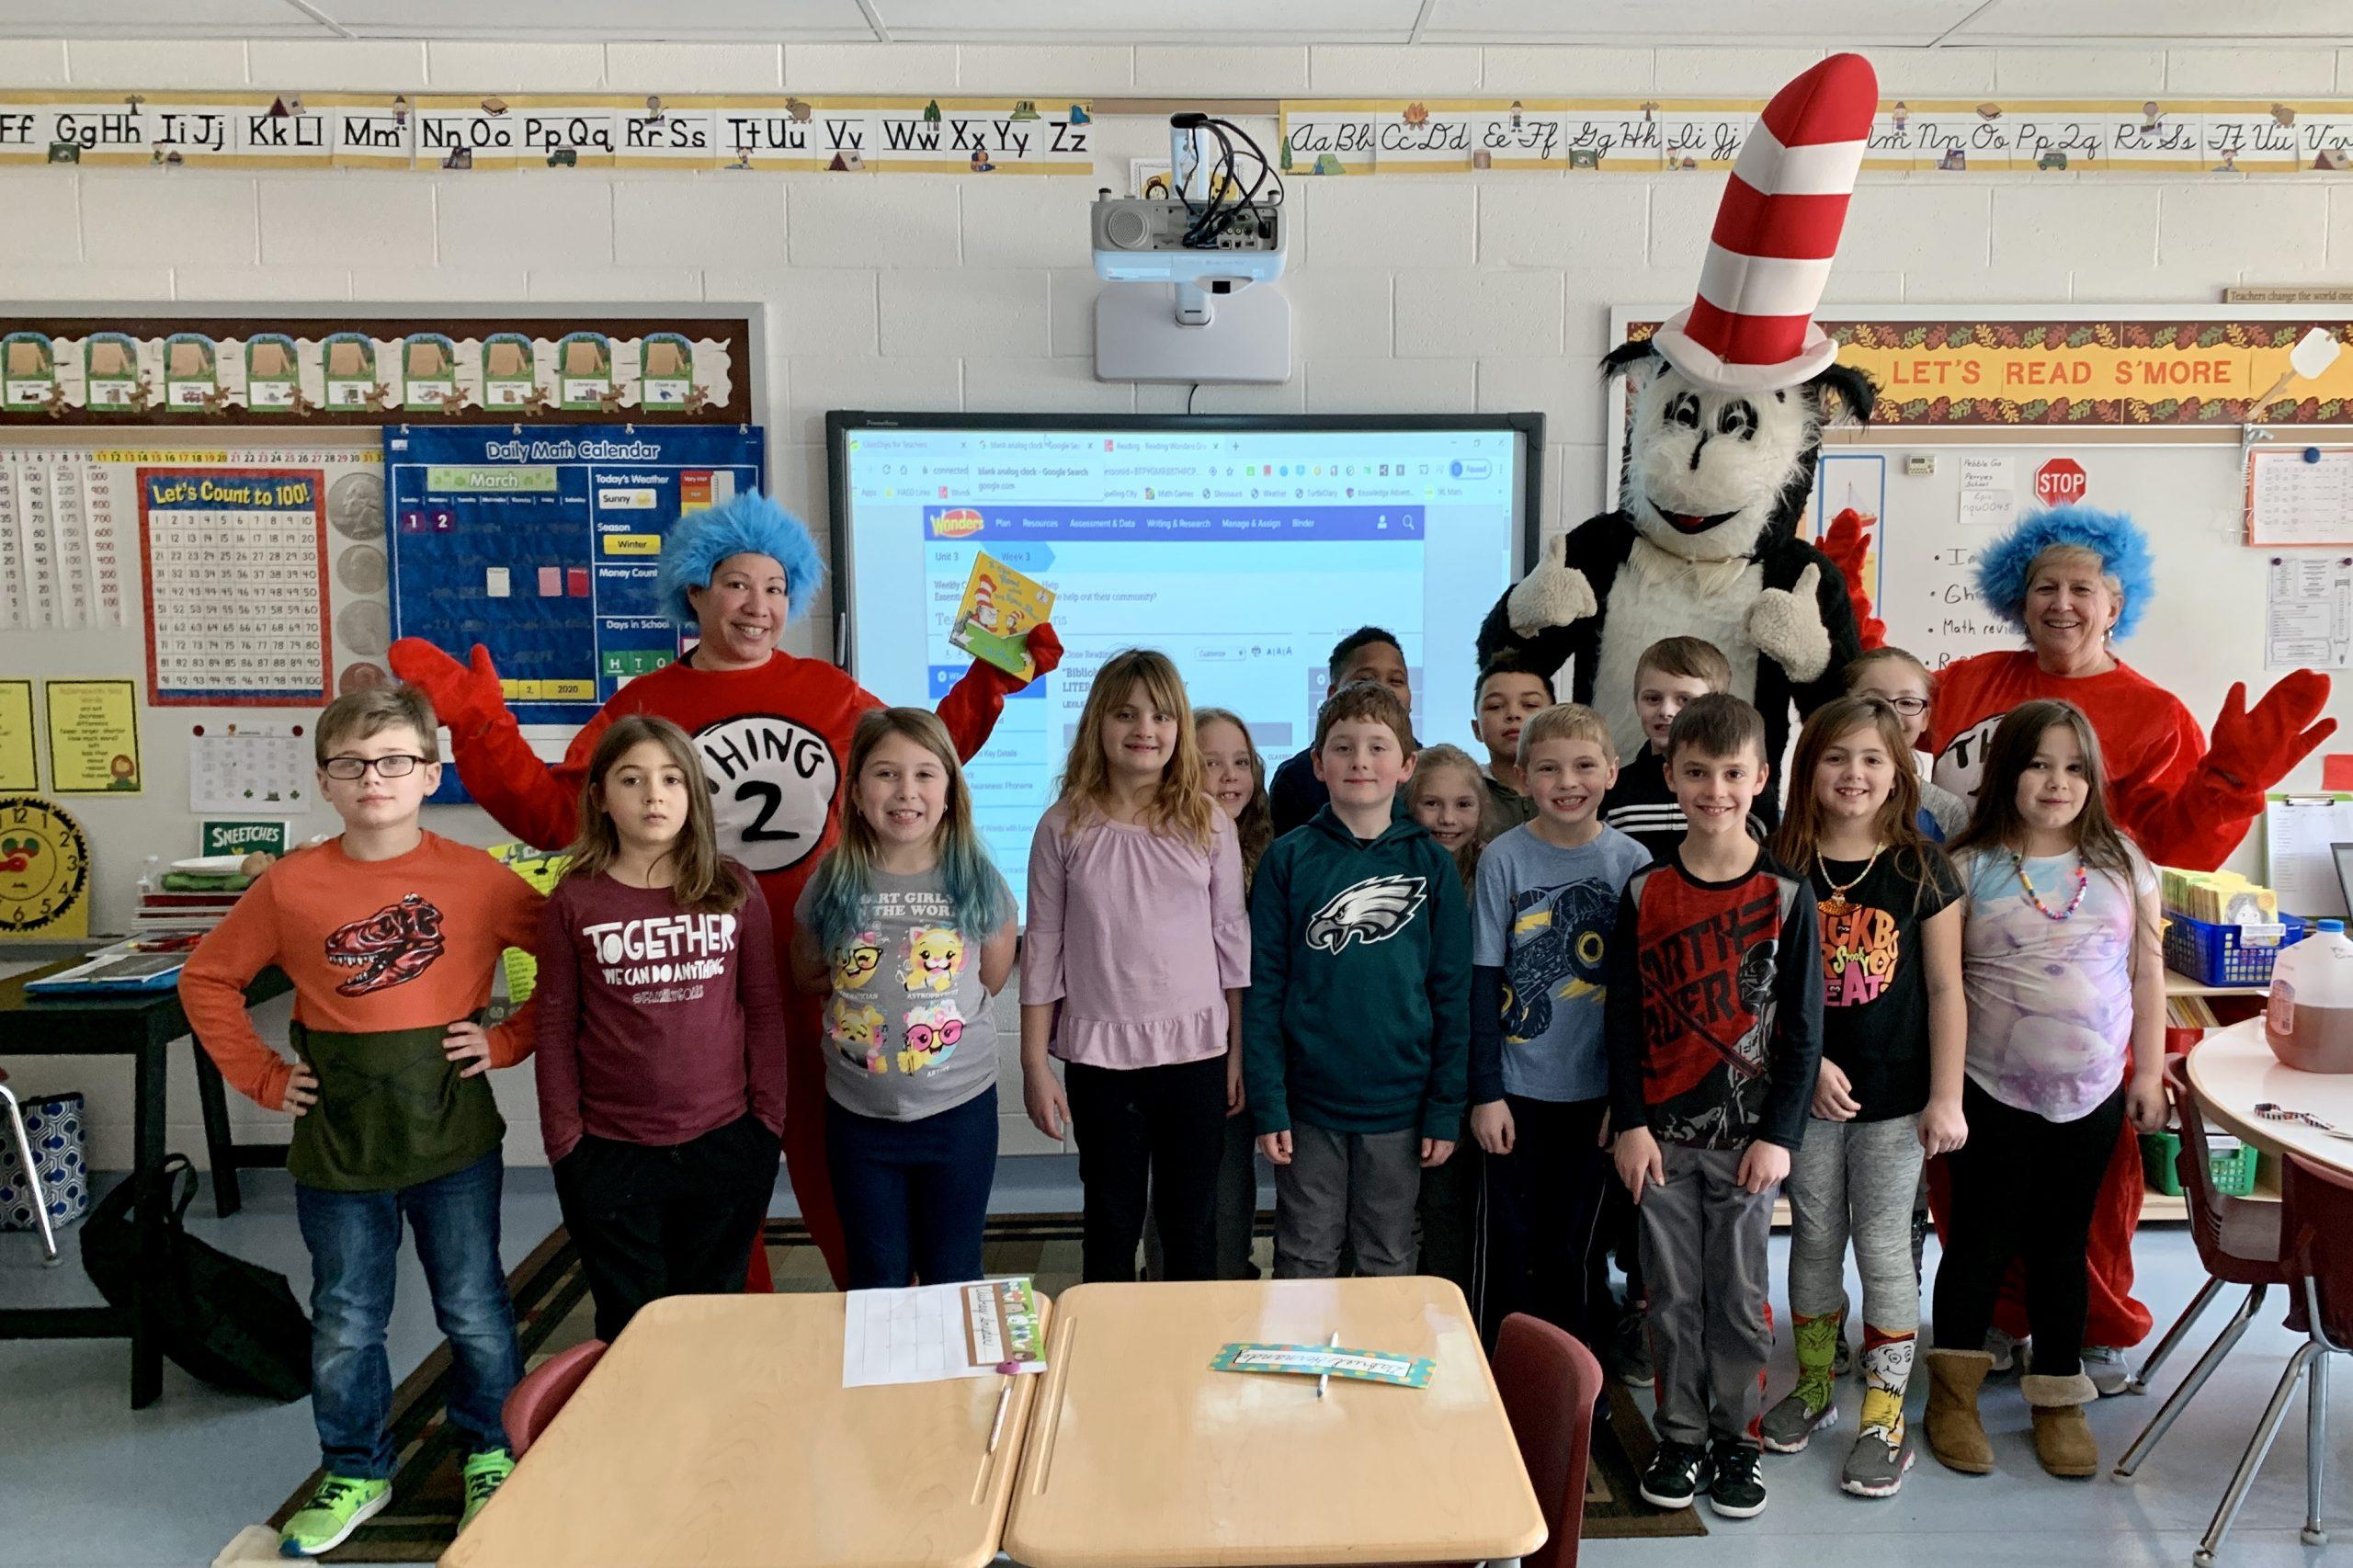 Local schools celebrate Dr. Seuss's birthday